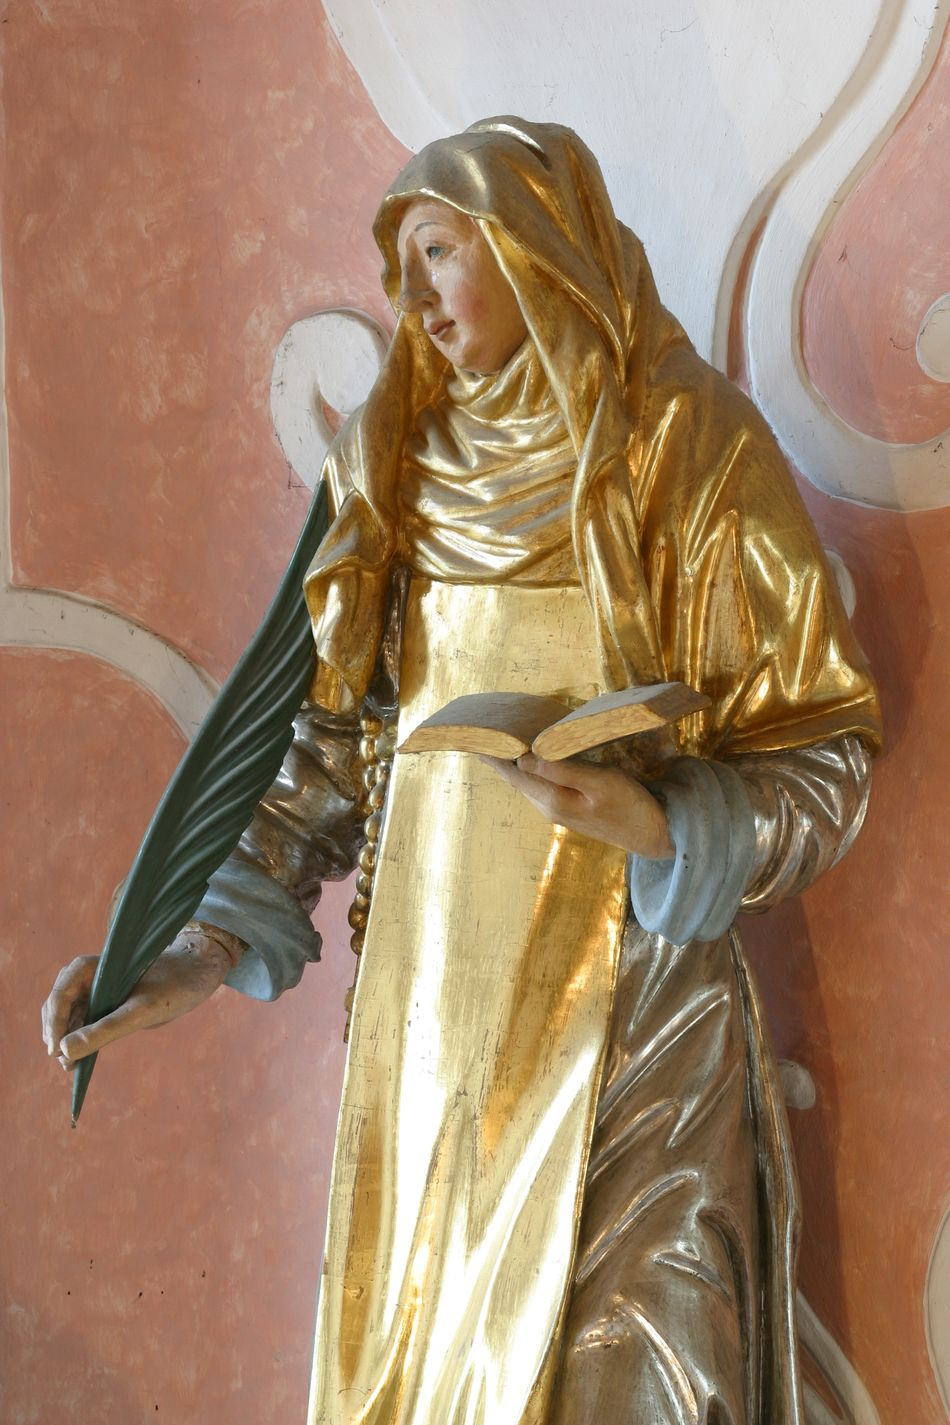 Saint Catherine of Siena Altar Art Belief Catherine Catherine Of Siena Christianity Church Croatia Faith Gold Colored Holy Place Of Worship Religion Religious  Saint Sculpture Siena Spiritual Spirituality Statue Worship